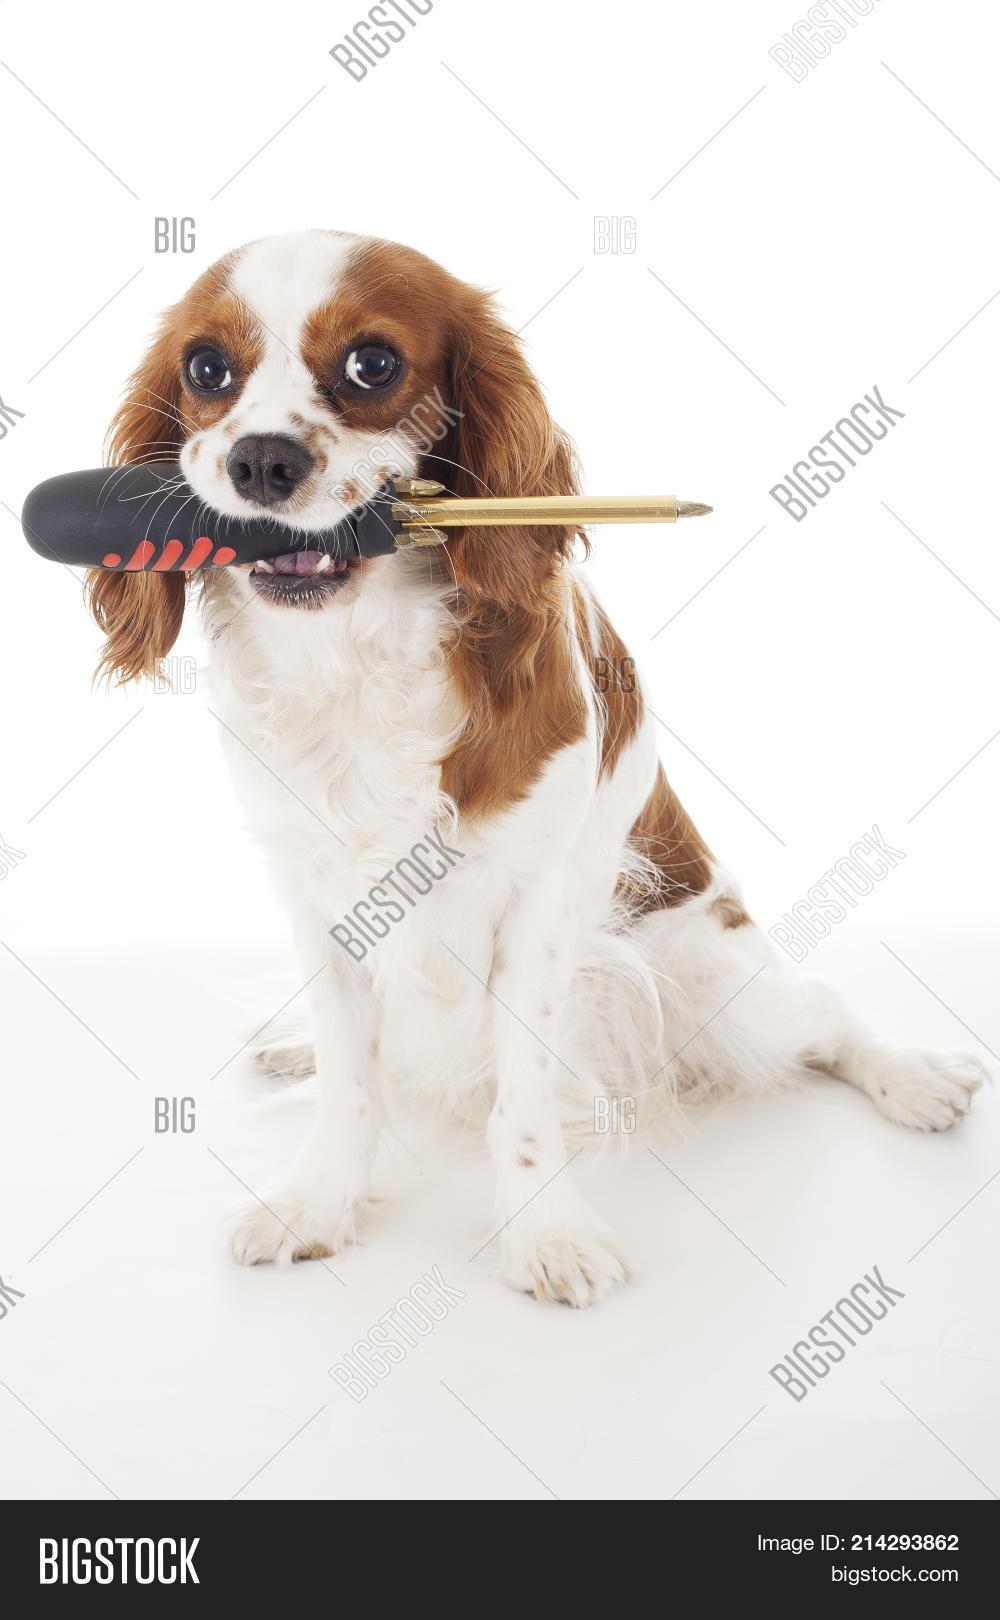 Wonderful Cavalier Canine Adorable Dog - 214293862  You Should Have_562350  .jpg